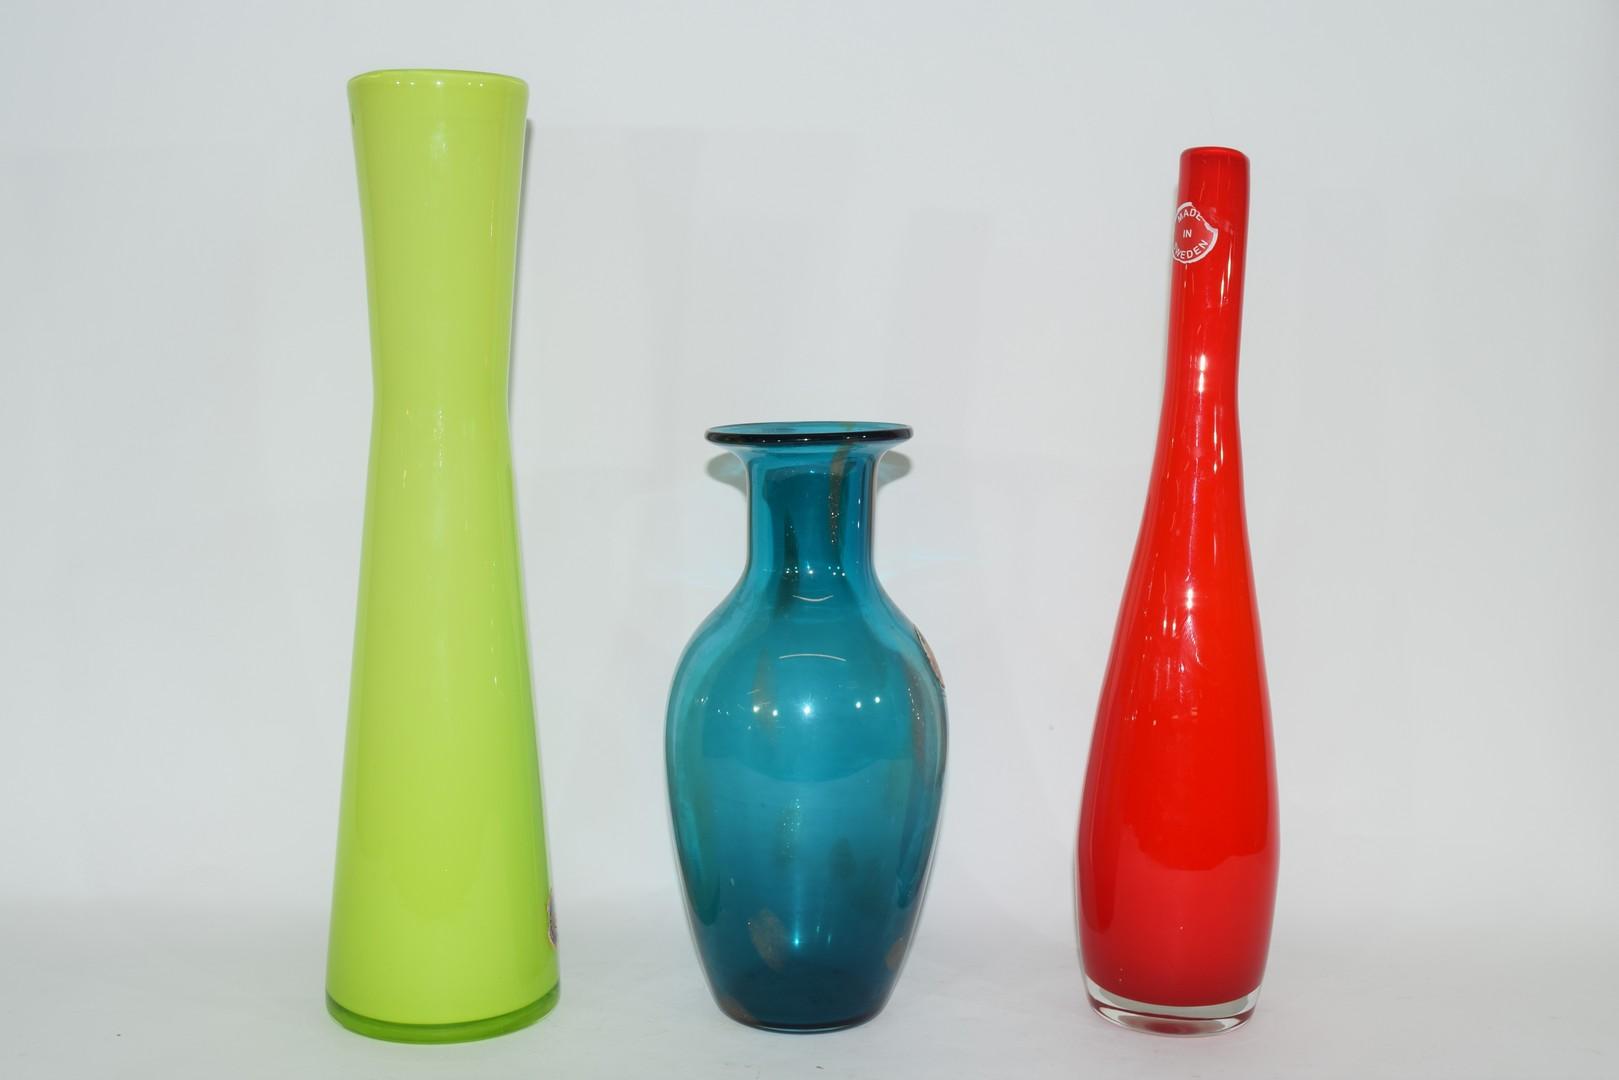 Group of three Swedish Art glass vases - Image 2 of 5